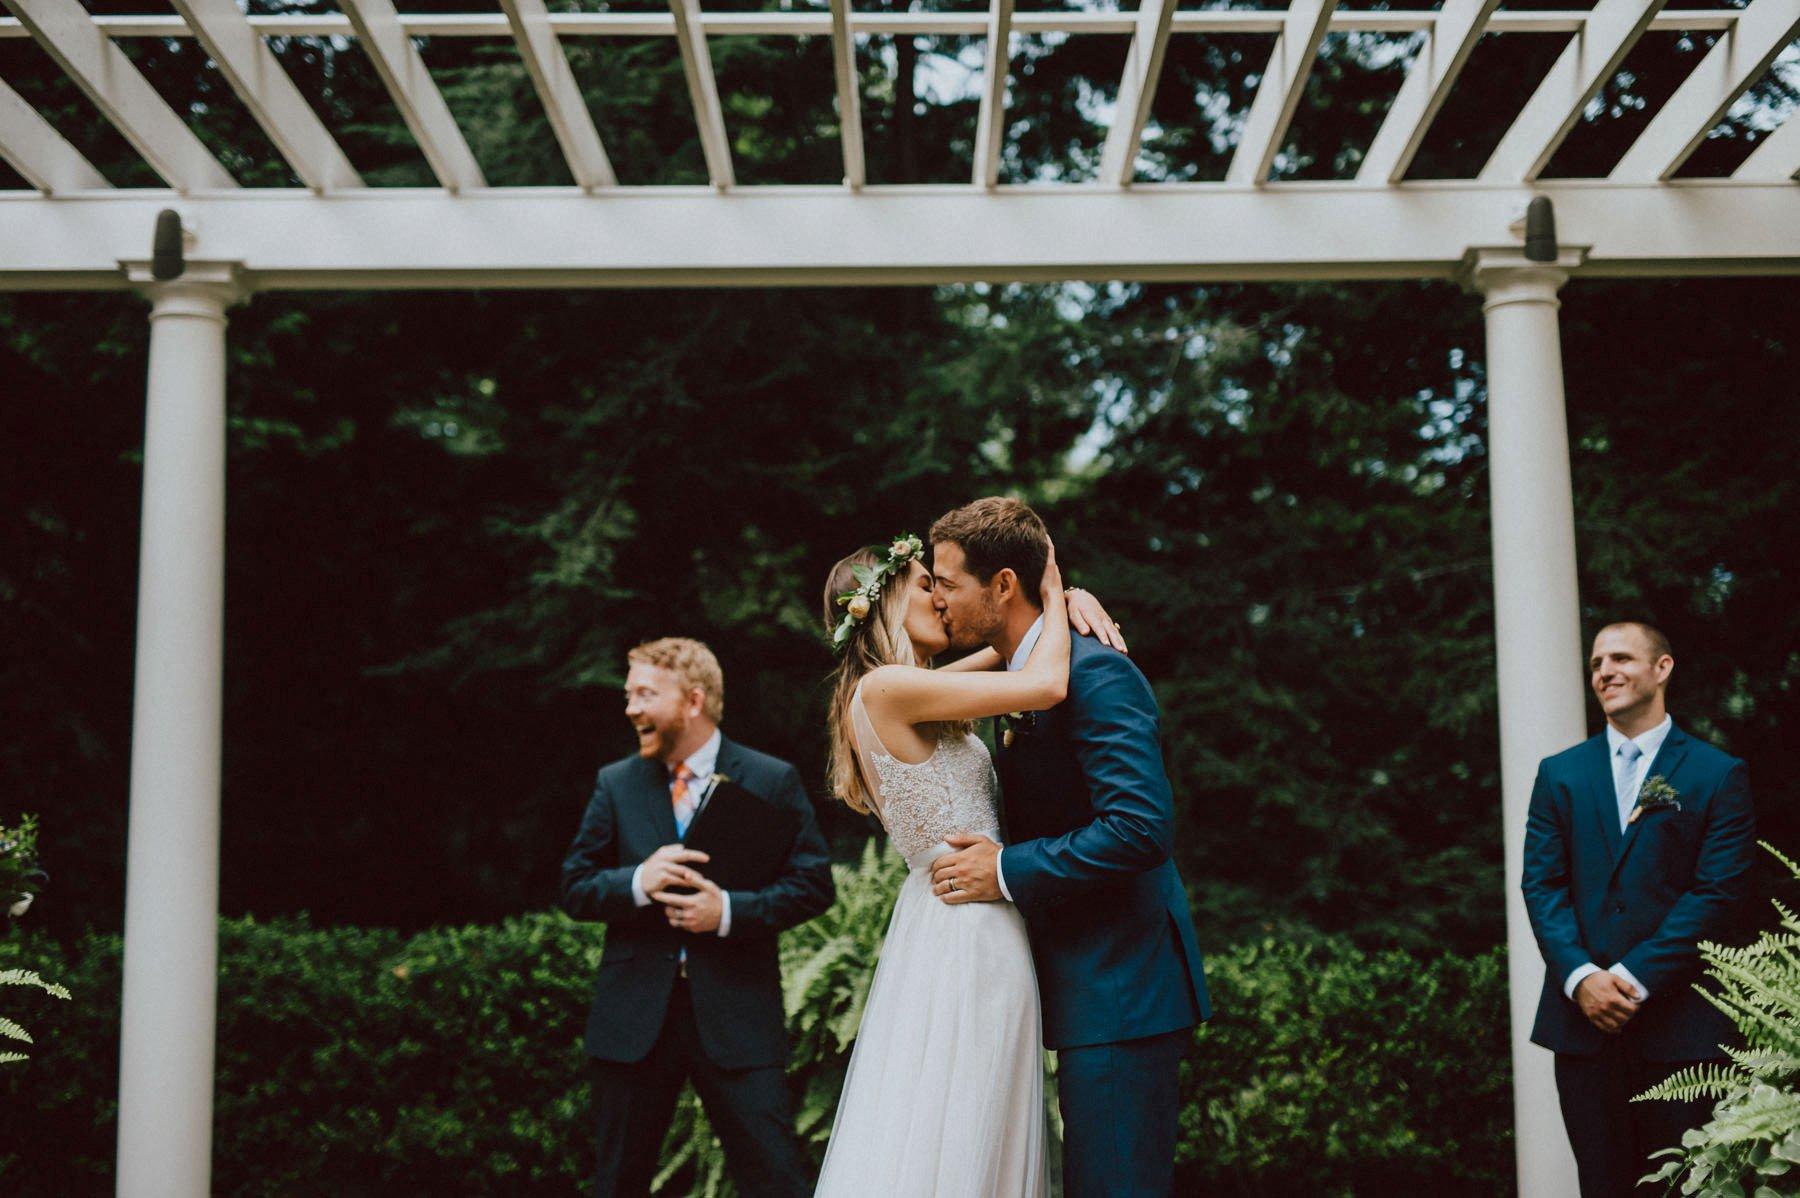 Knowlton-mansion-wedding-99.jpg